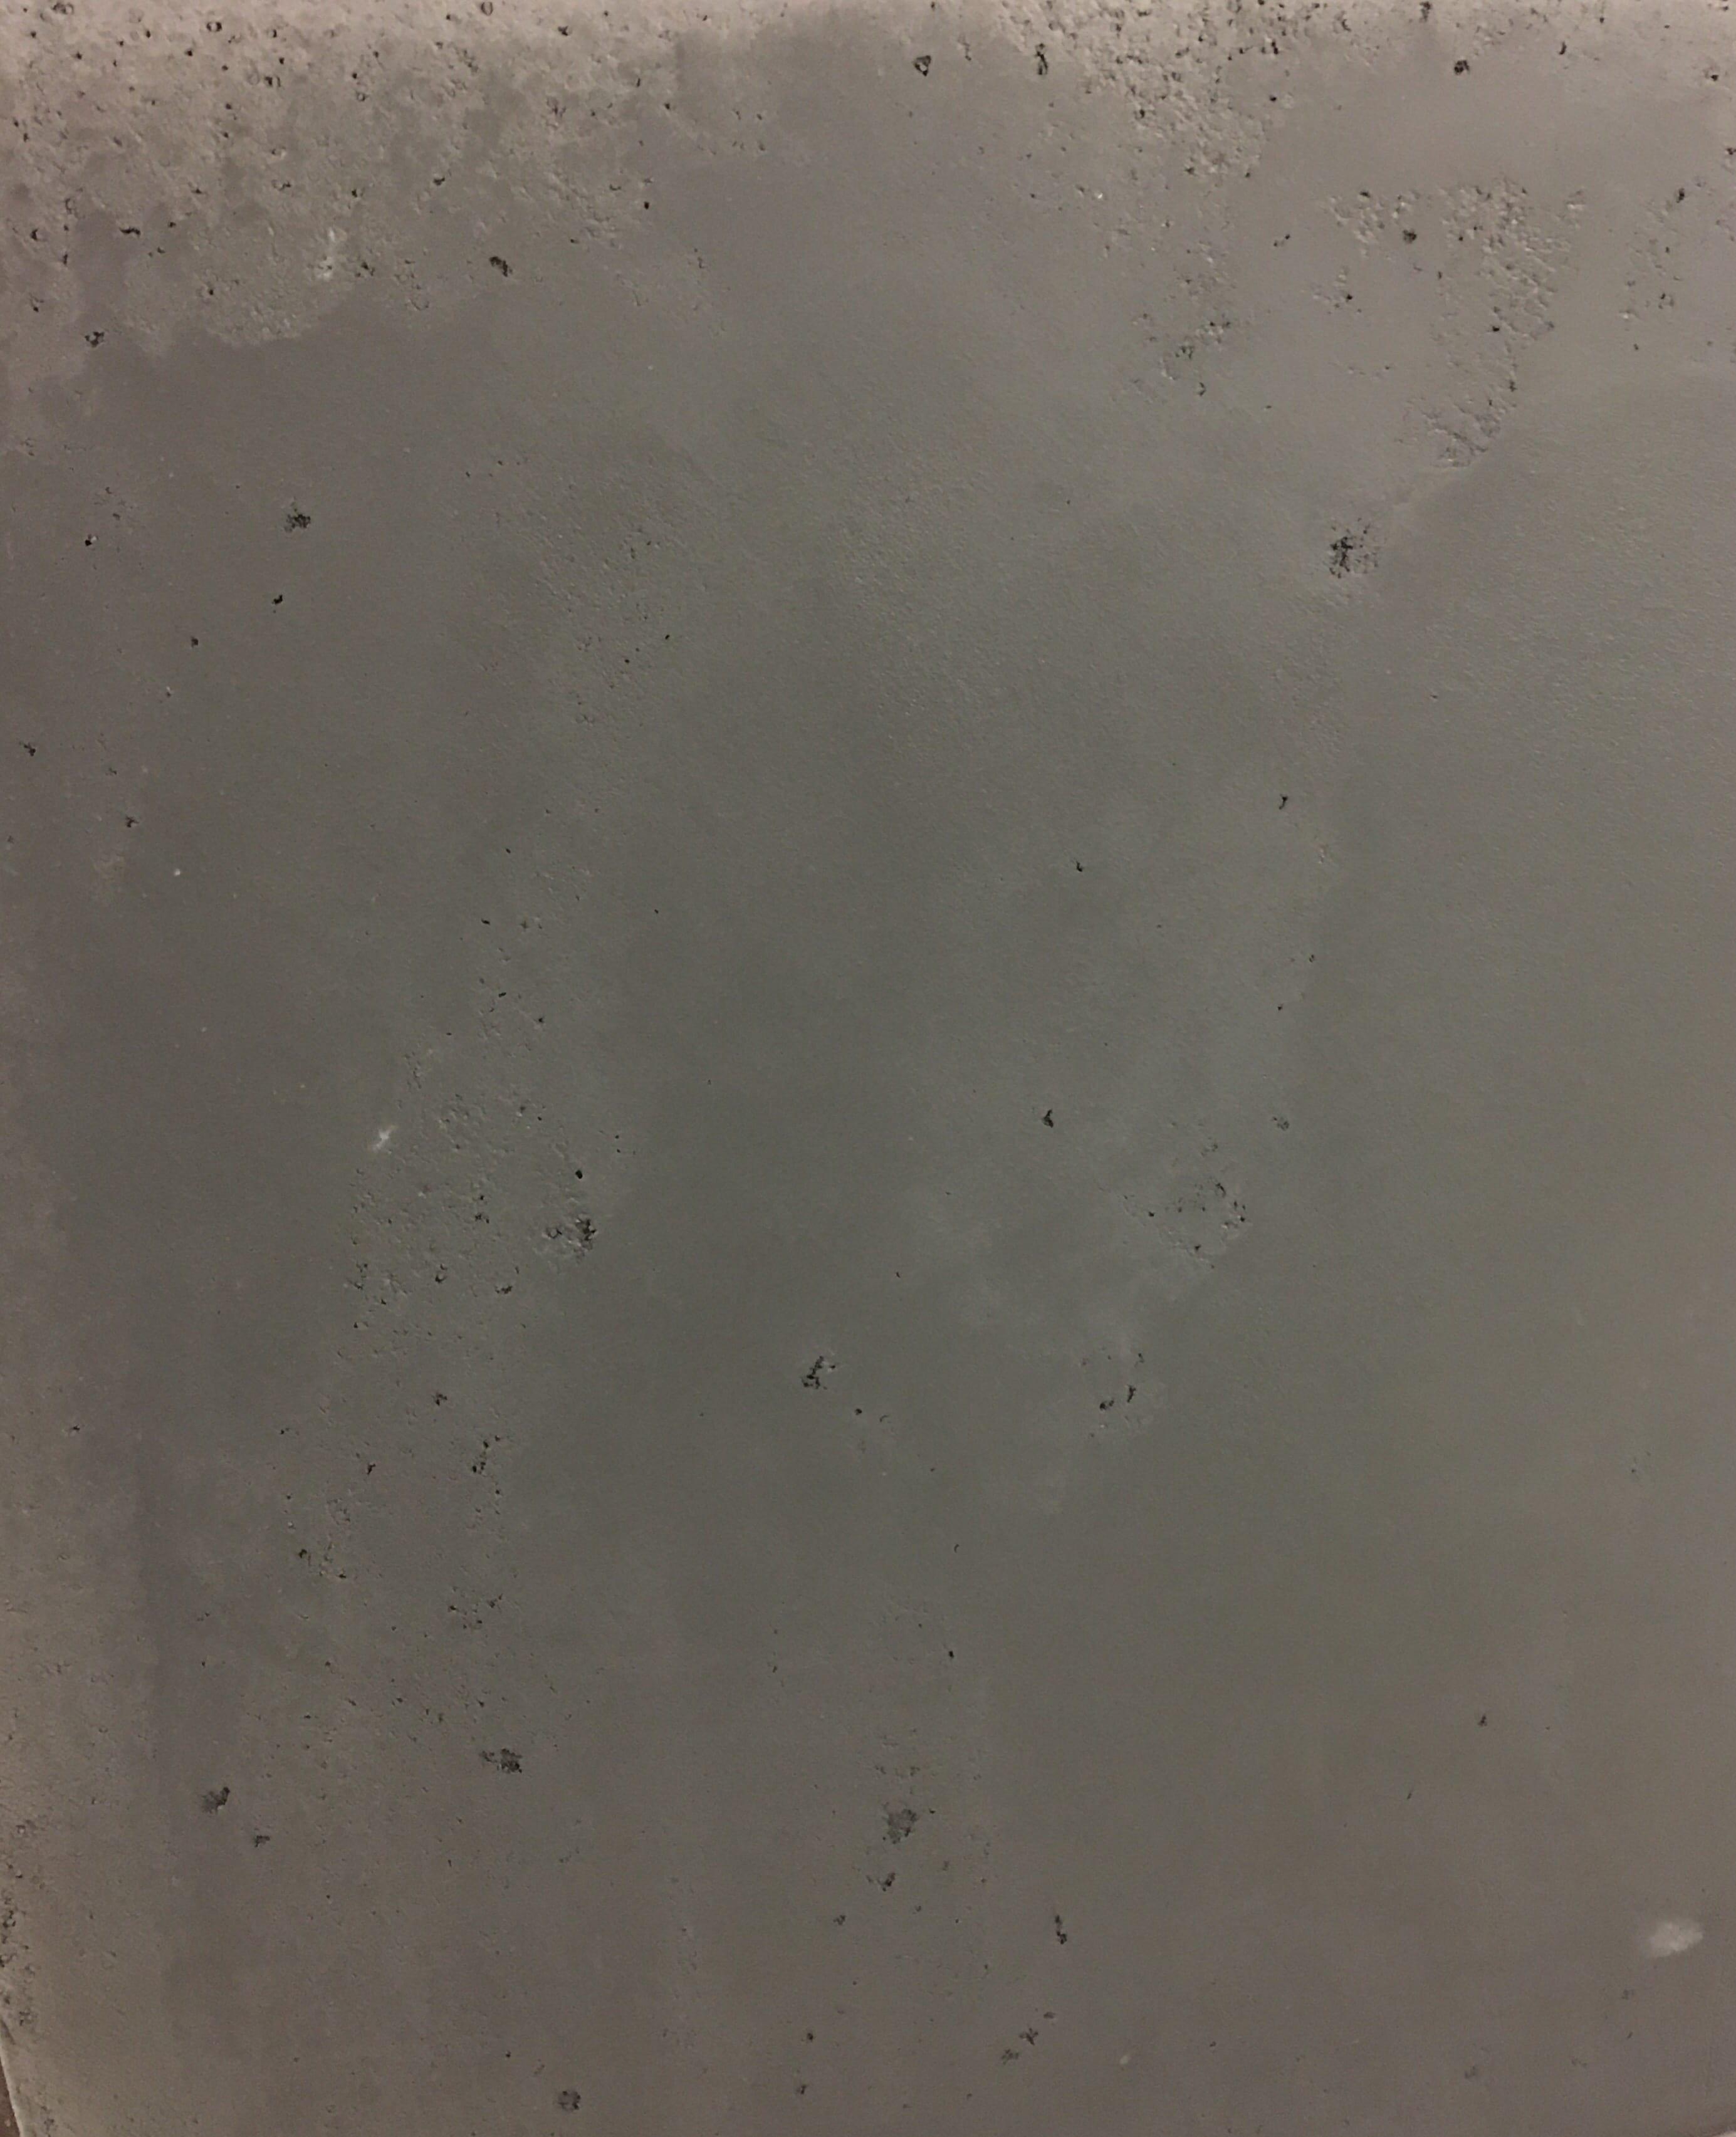 Tadelakt, shower plaster, lime plaster, Venetian Historical Lime Plaster, Industrial Studio Concrete Plaster, Italian Lime Marmarino Plasters, Boston Brookline Massachusetts, Providence Newport Ri, Pop Focal Walls, Tadelakt Shower Plasters, Natural Lime Finishes, New Cabinet Refinishing, Renew Cabinet Painting, Painting Decorative Applications, High Quality Interior Painting